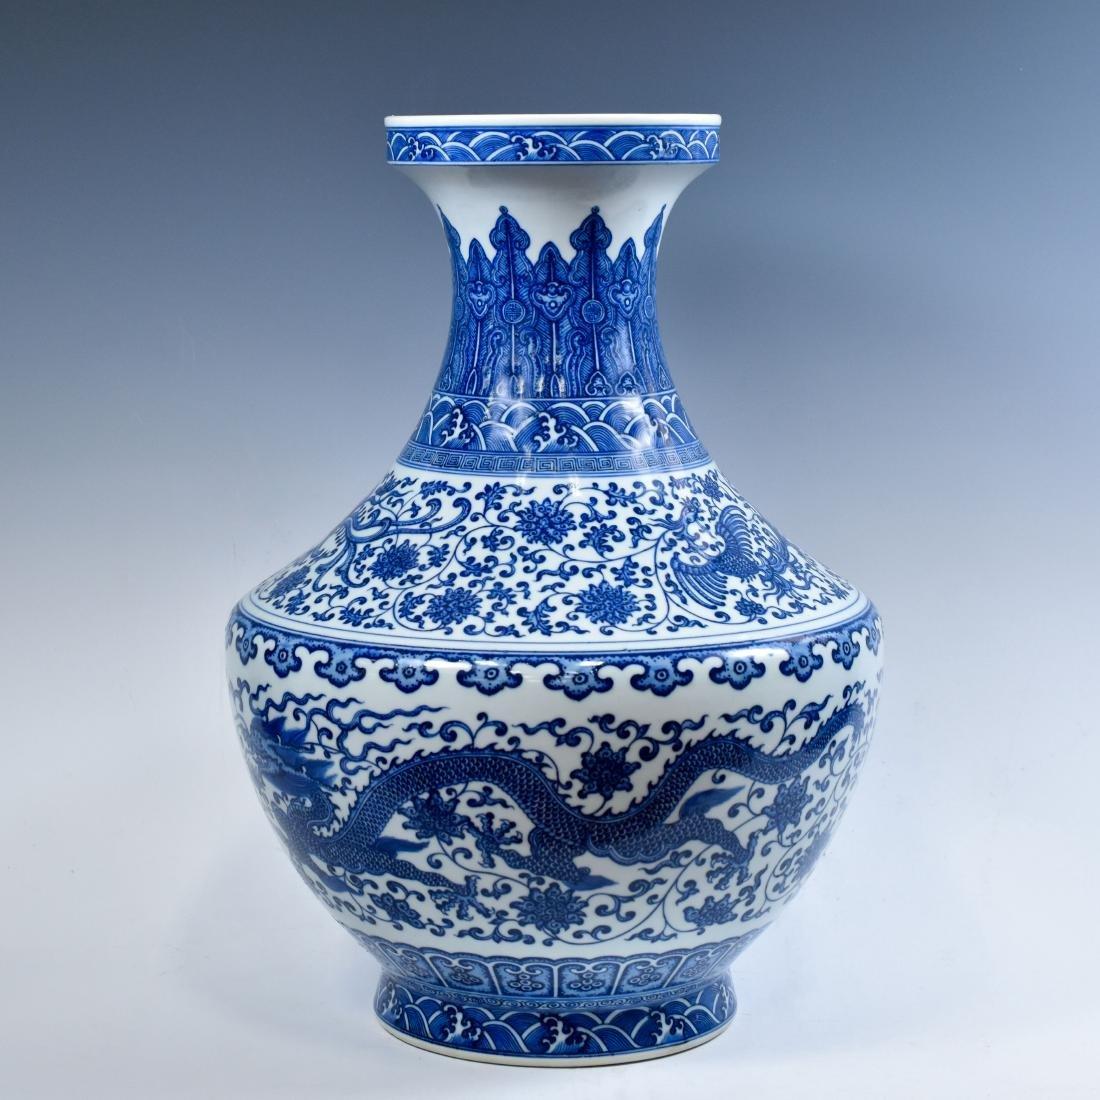 LARGE CHINESE BLUE & WHITE DRAGON LOTUS ARROW VASE - 4